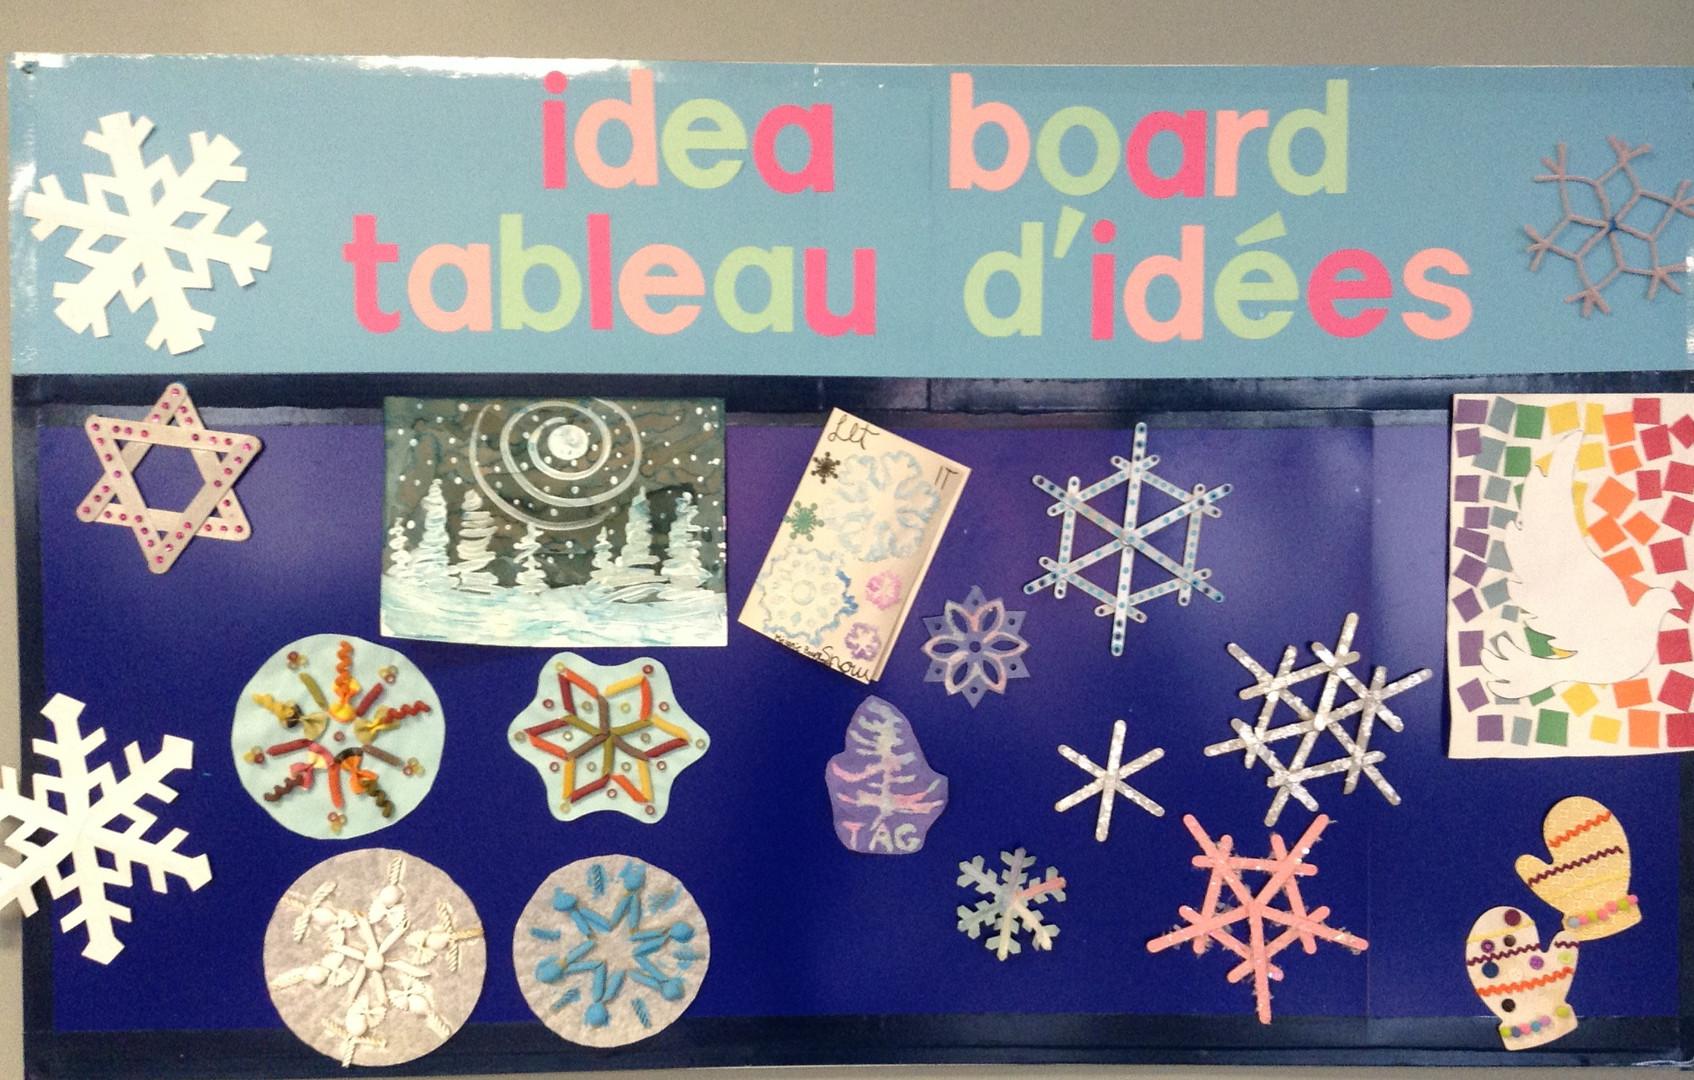 Idea Board//Tableau d'idées